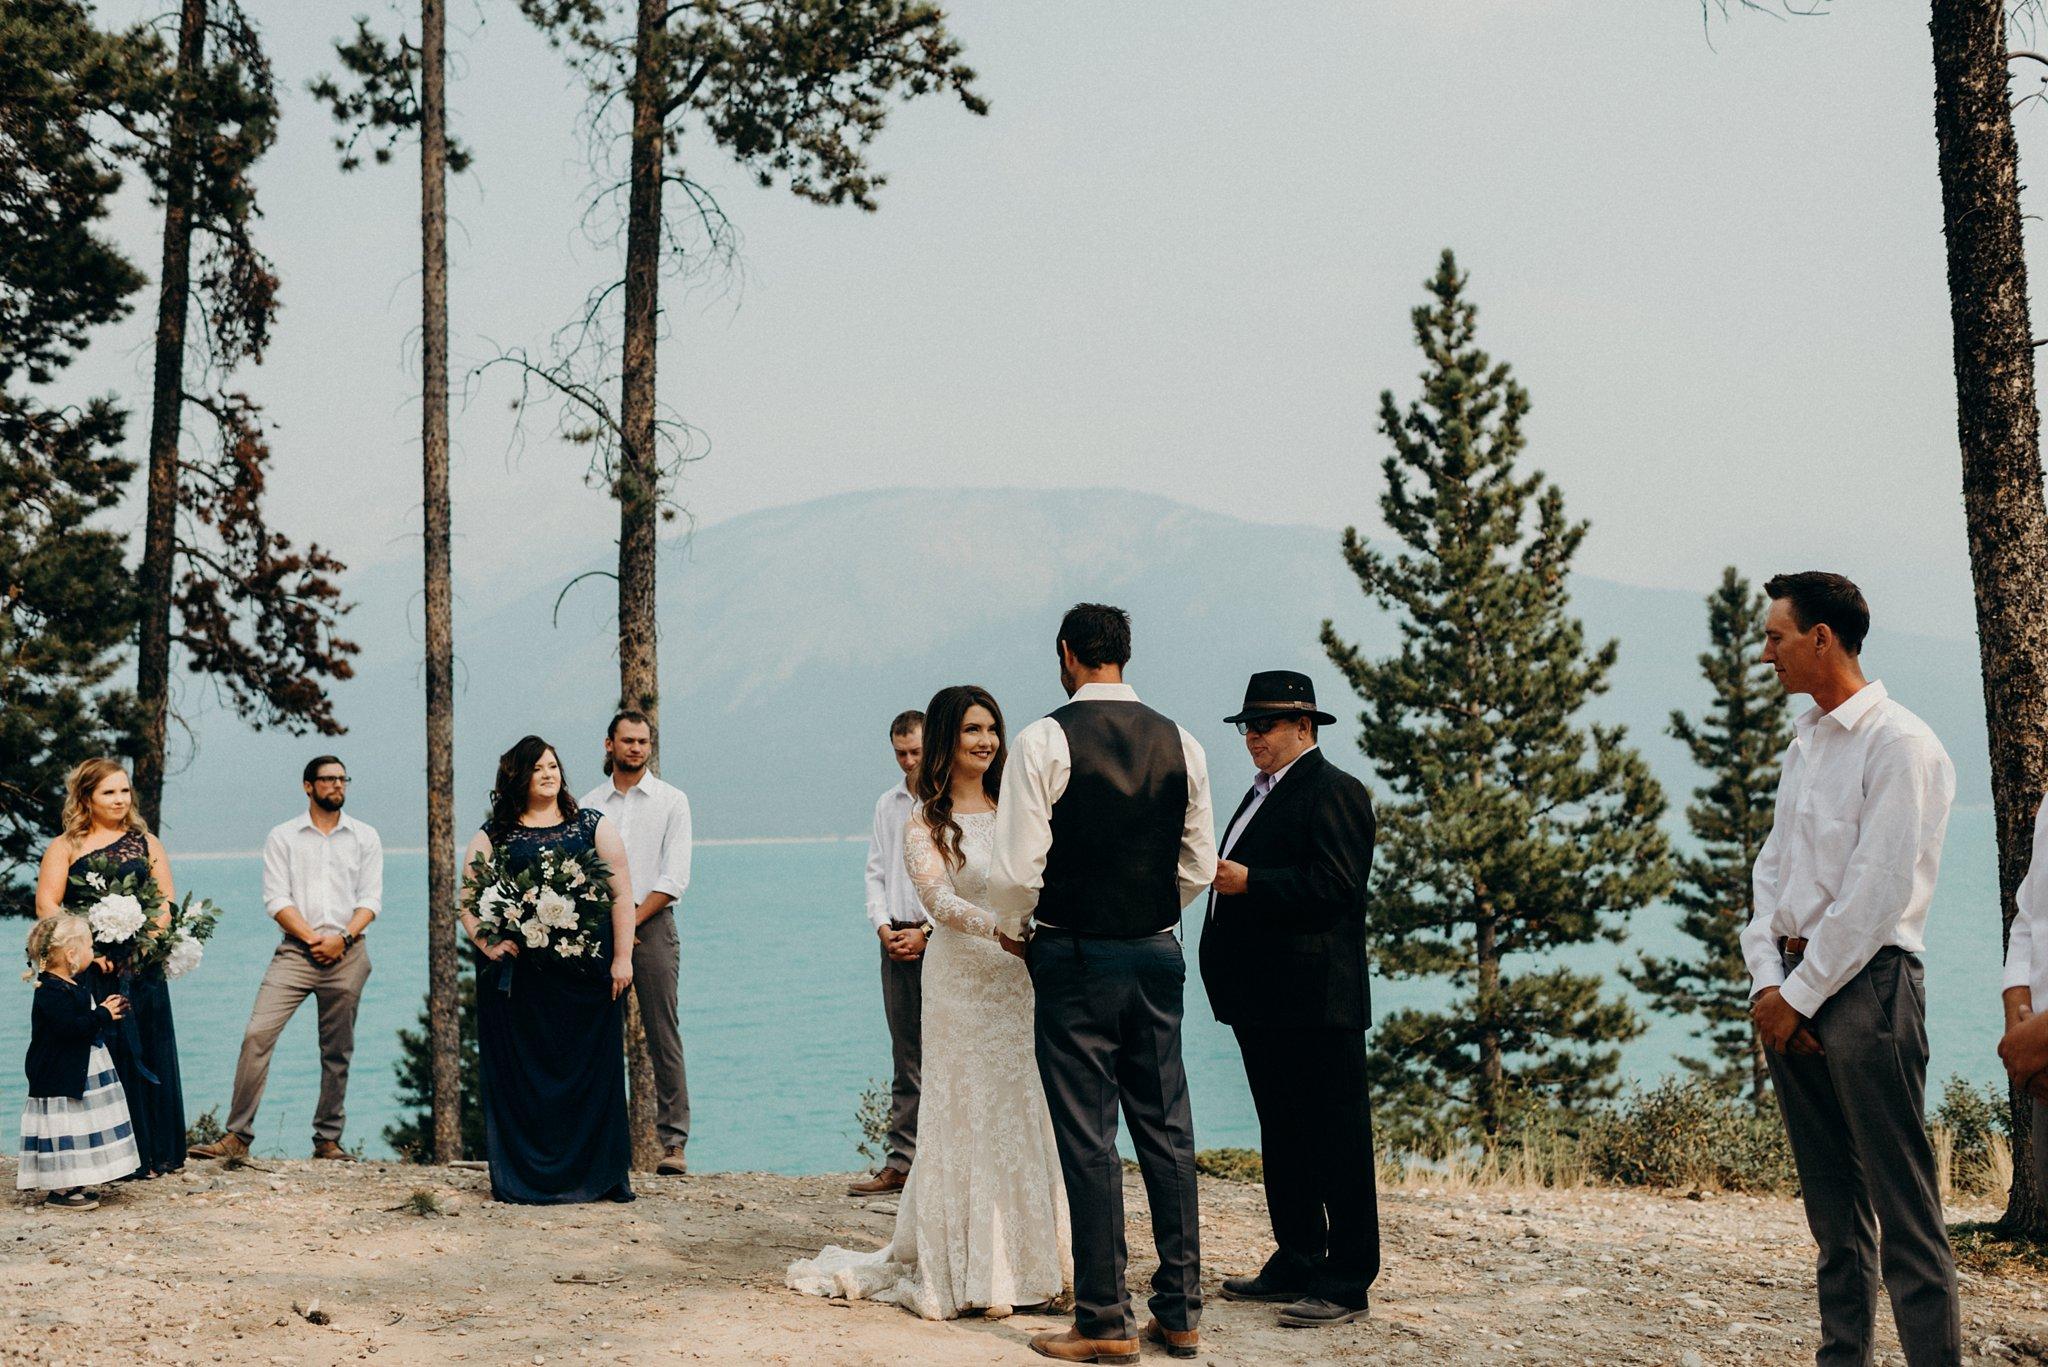 kaihla_tonai_intimate_wedding_elopement_photographer_6724.jpg